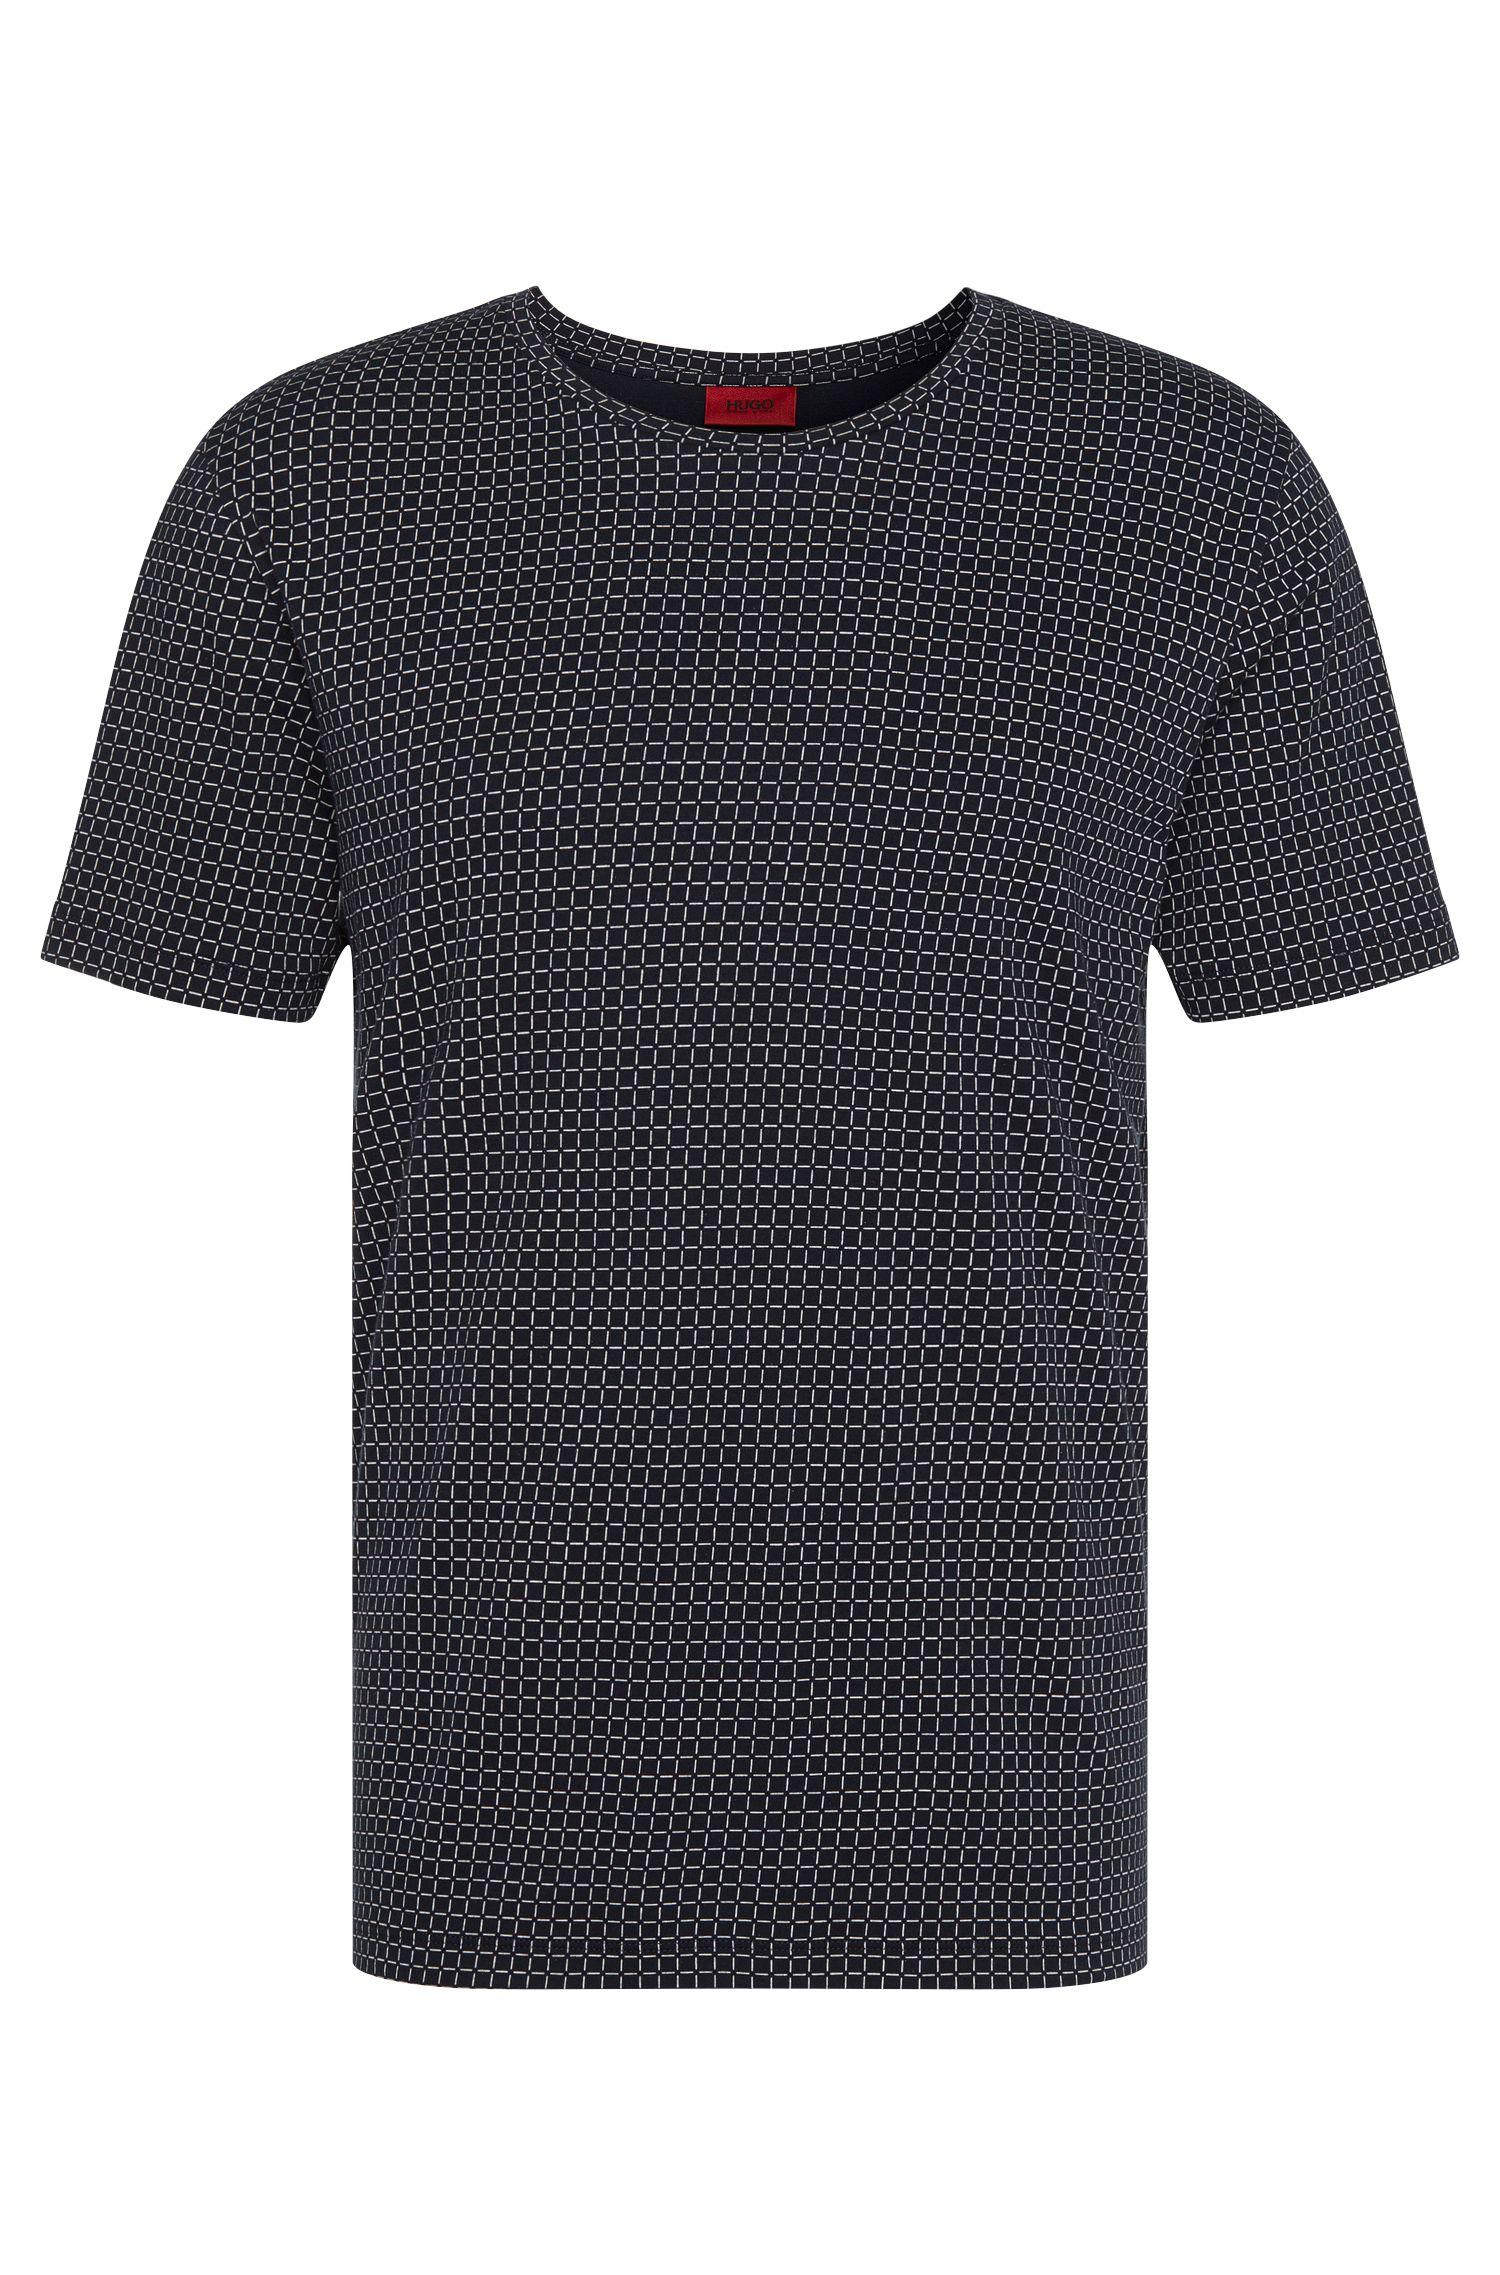 'Drid' | Cotton Printed T-Shirt